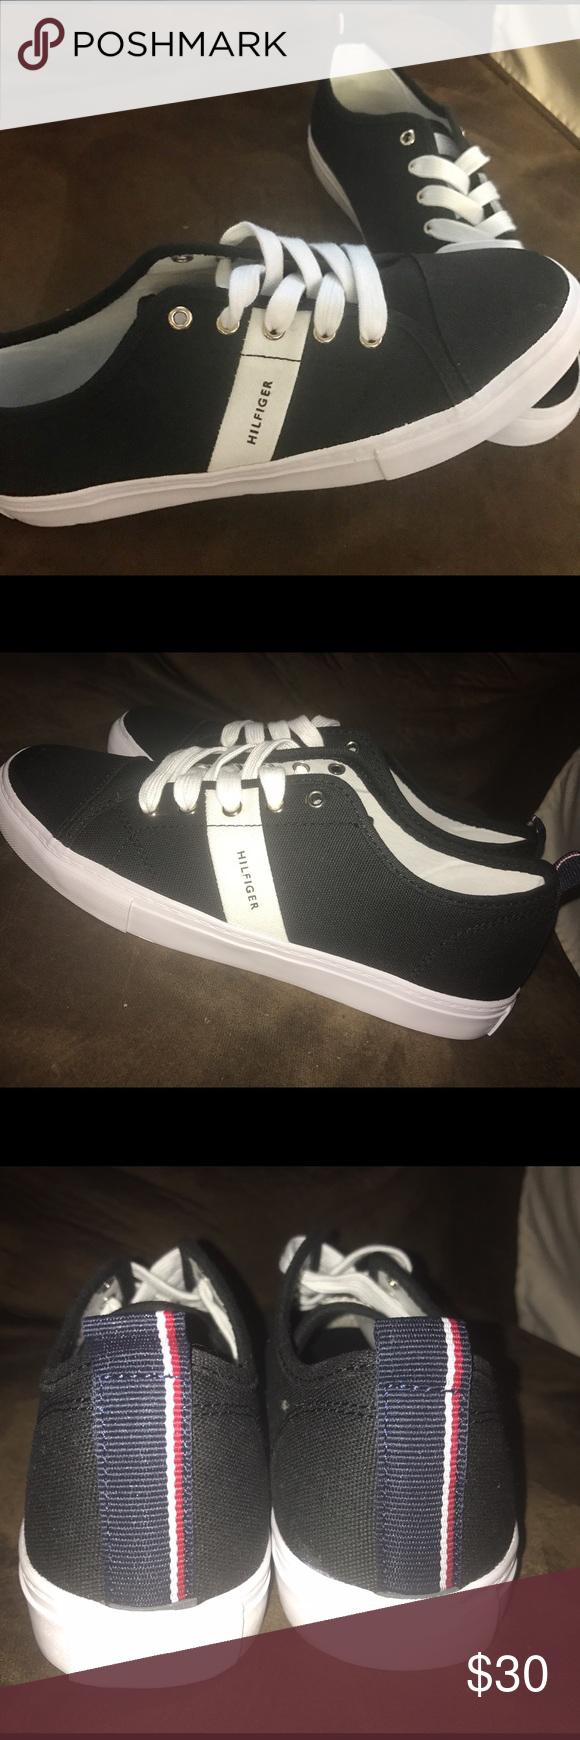 Tommy Hilfiger Sneakers Unworn size 8 1/2 Black Tommy Hilfiger sneakers Tommy Hilfiger Shoes Sneakers